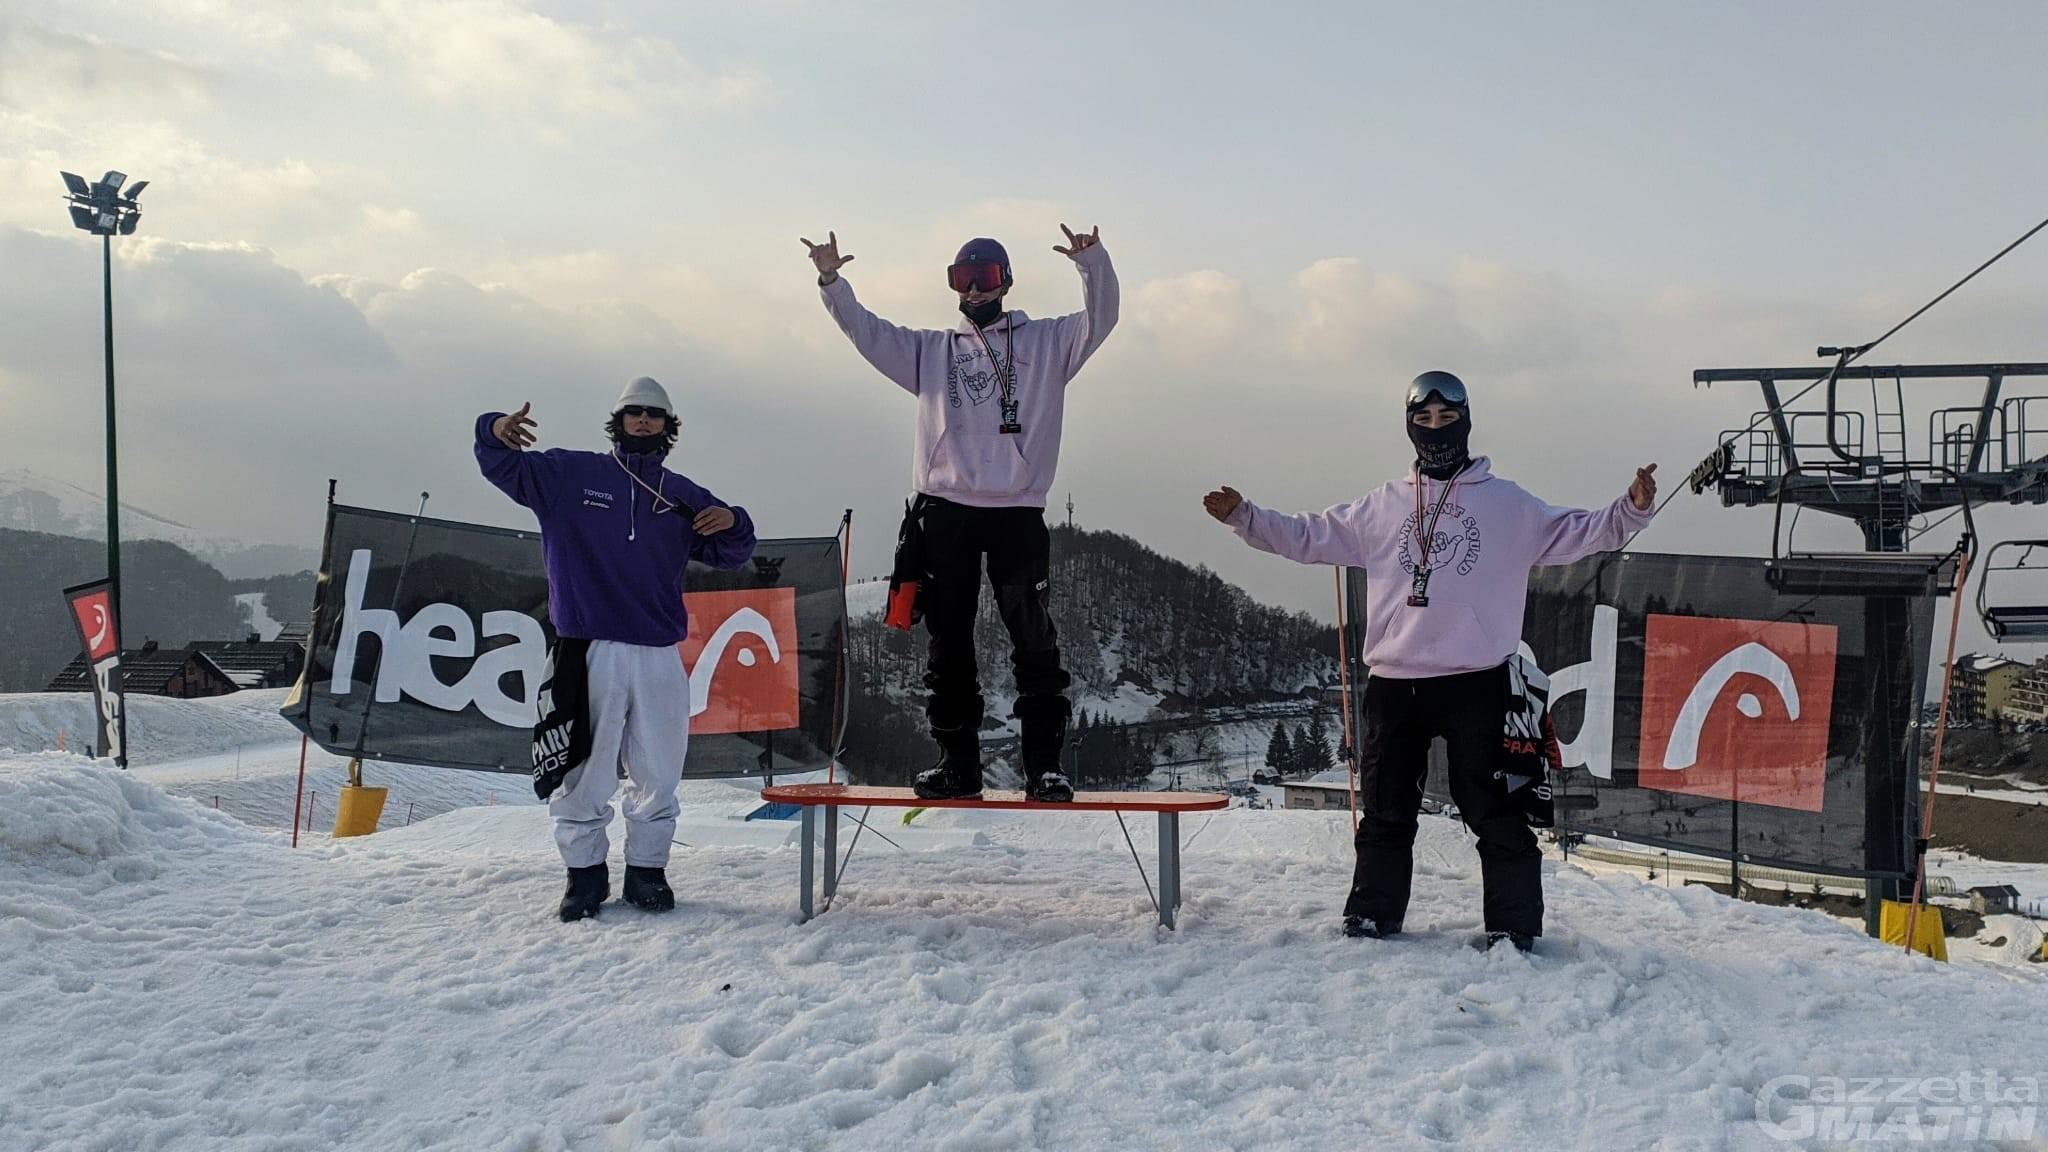 Snowboard: valdostani protagonisti in Coppa Italia a Prato Nevoso